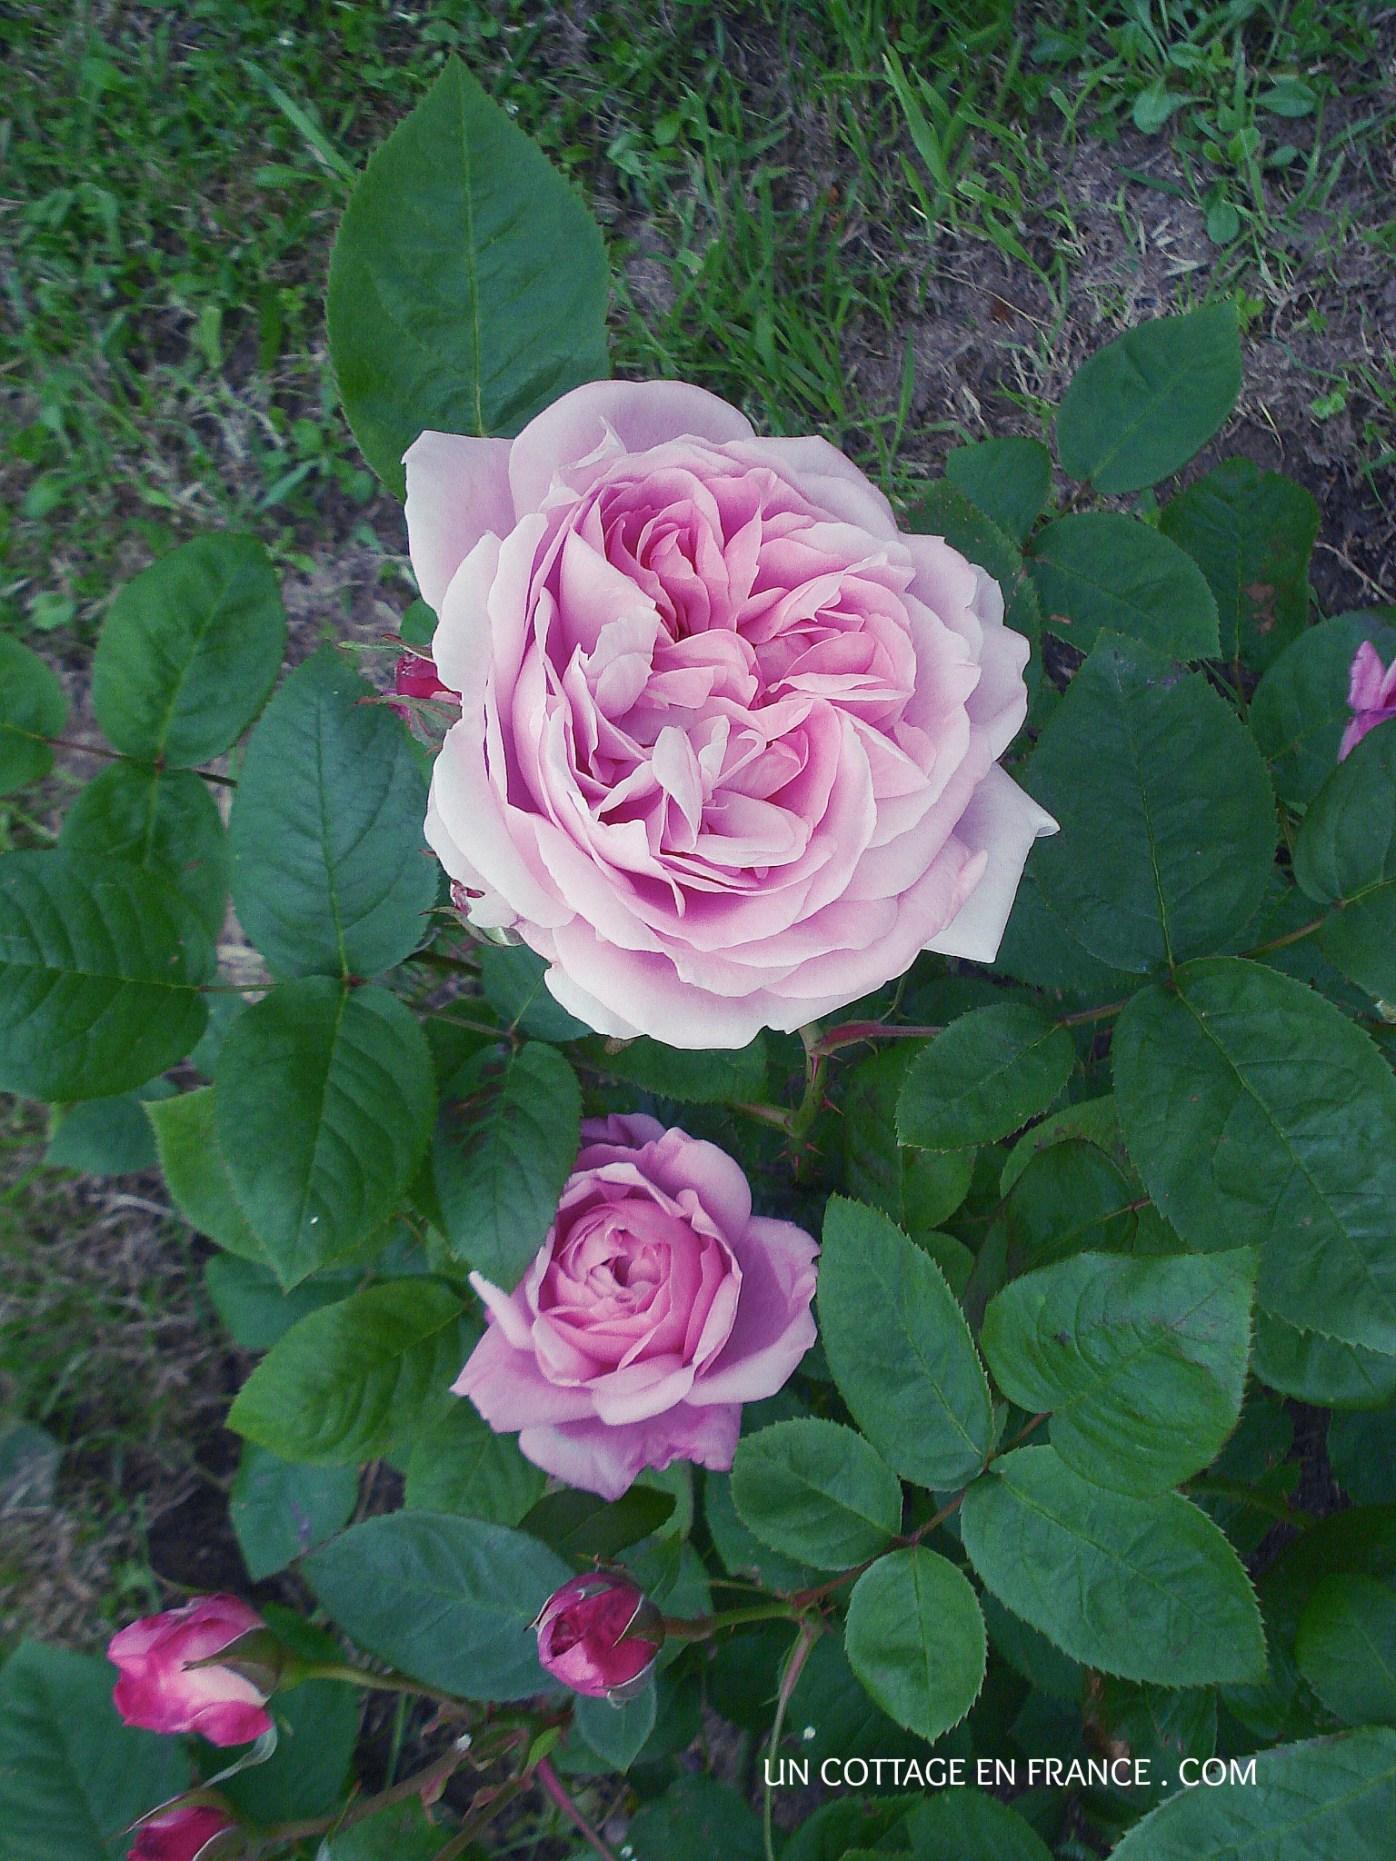 Mary Rose de David Austin au jardin du cottage